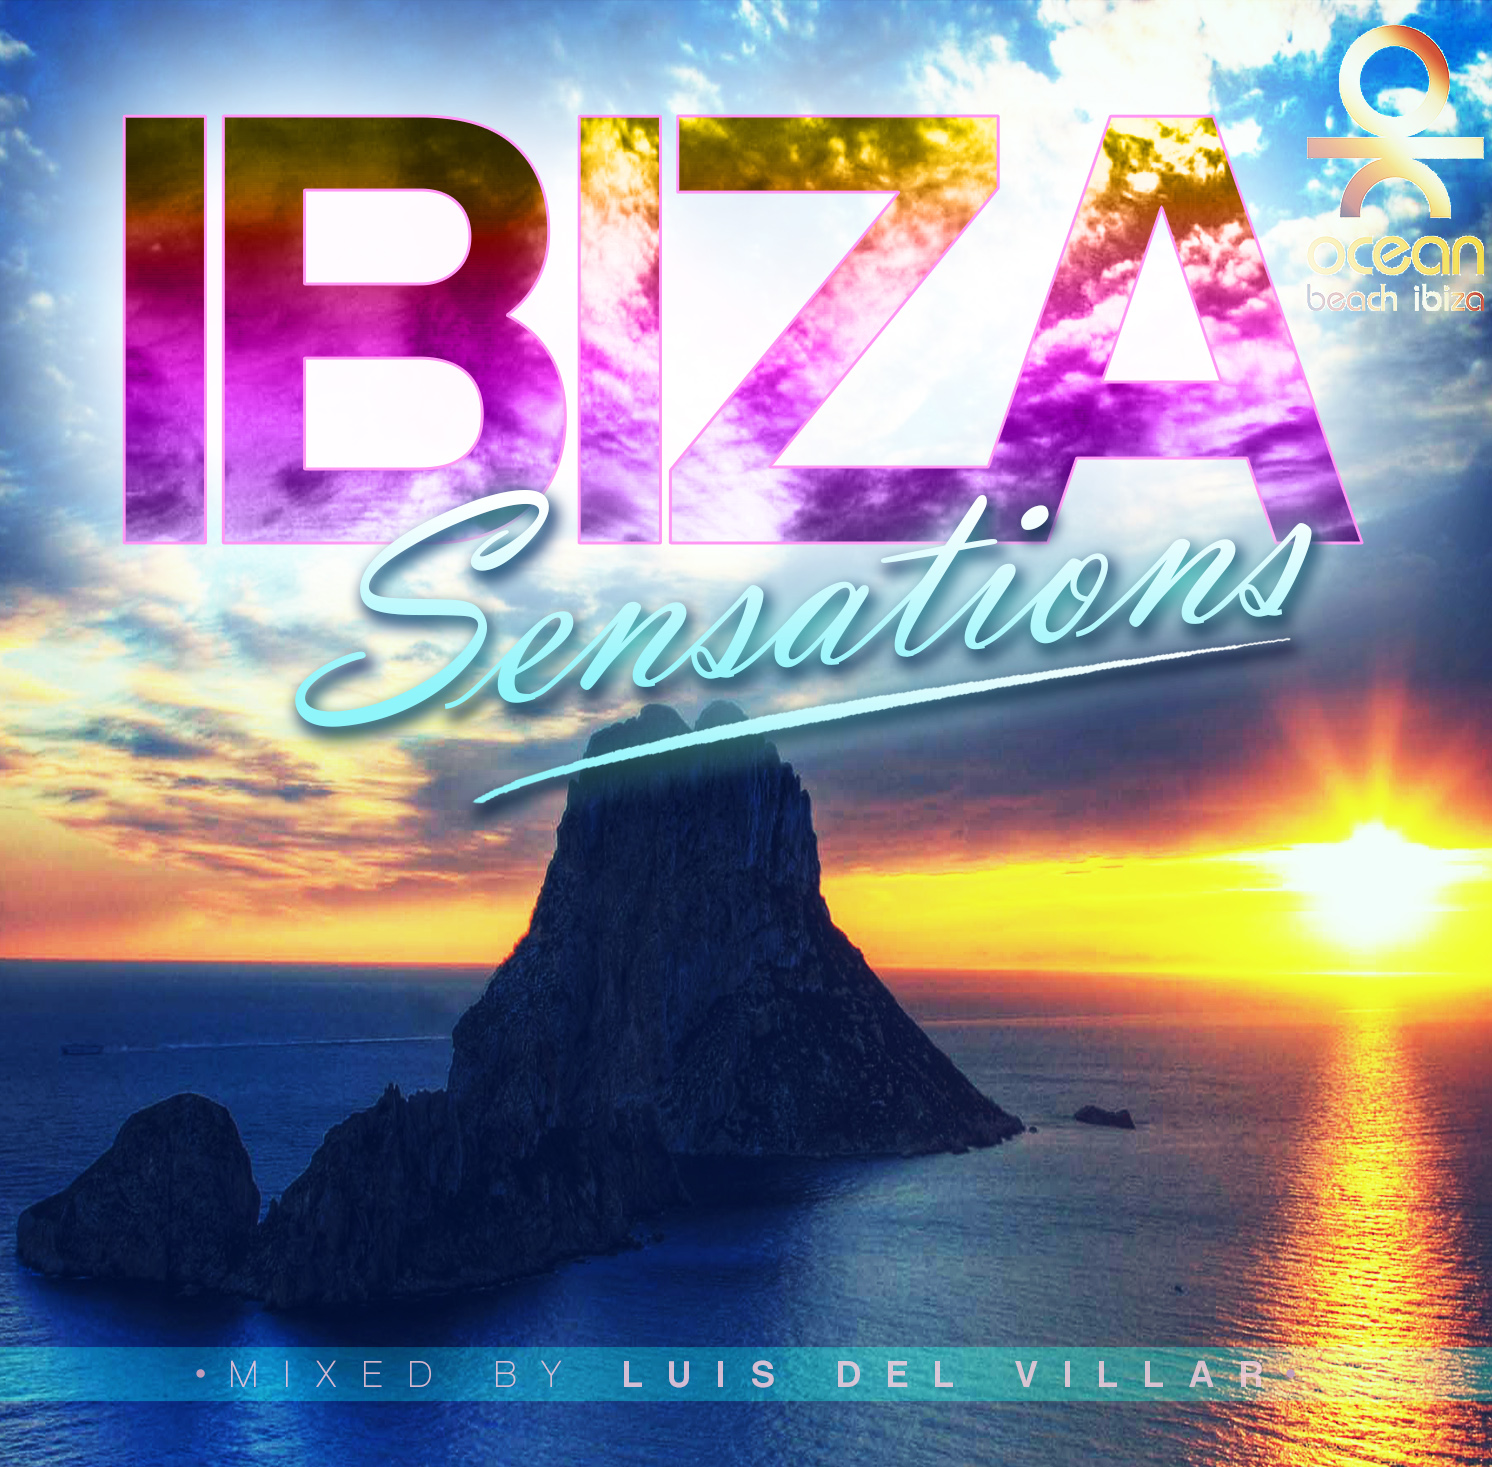 Artwork for Ibiza Sensations 93